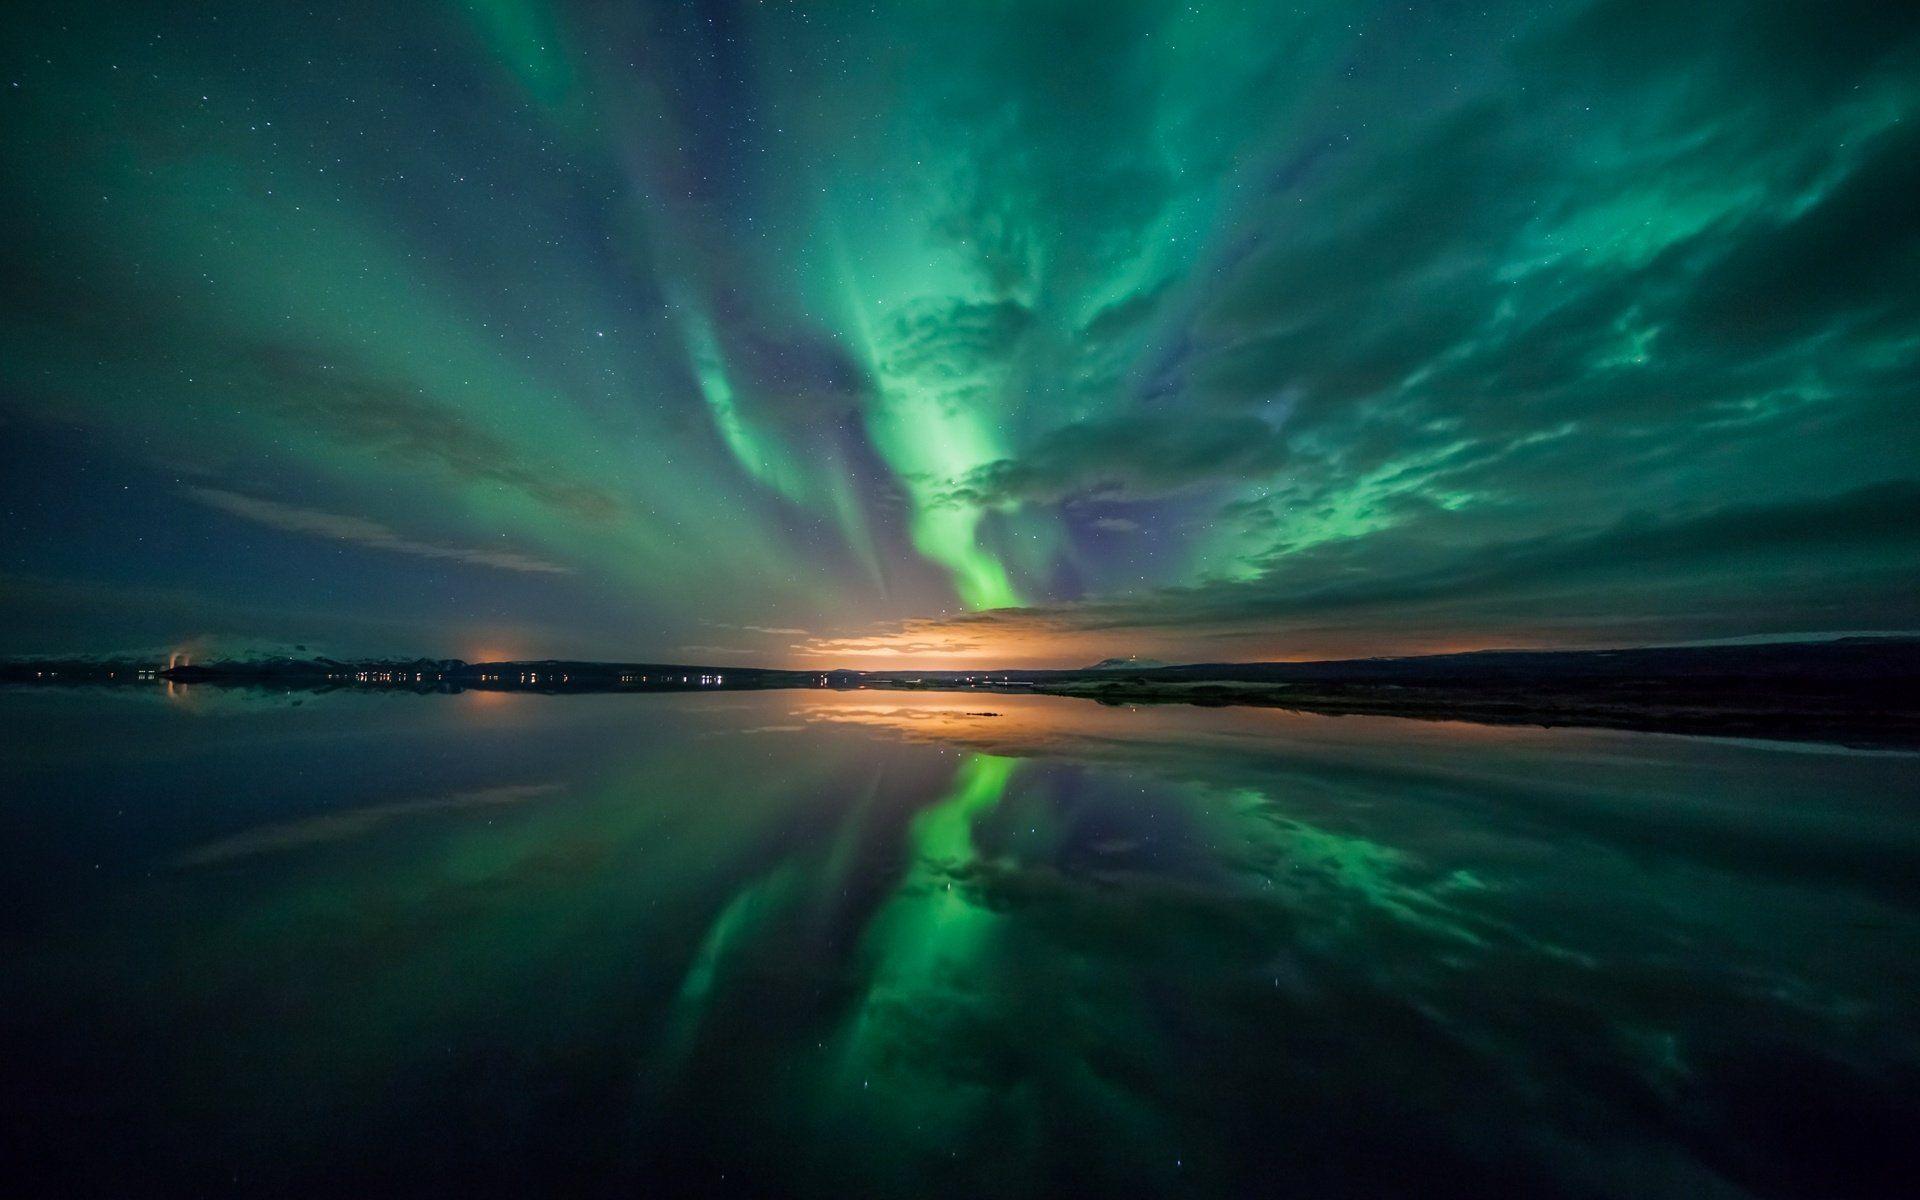 Aurora Borealis Wallpaper Moving